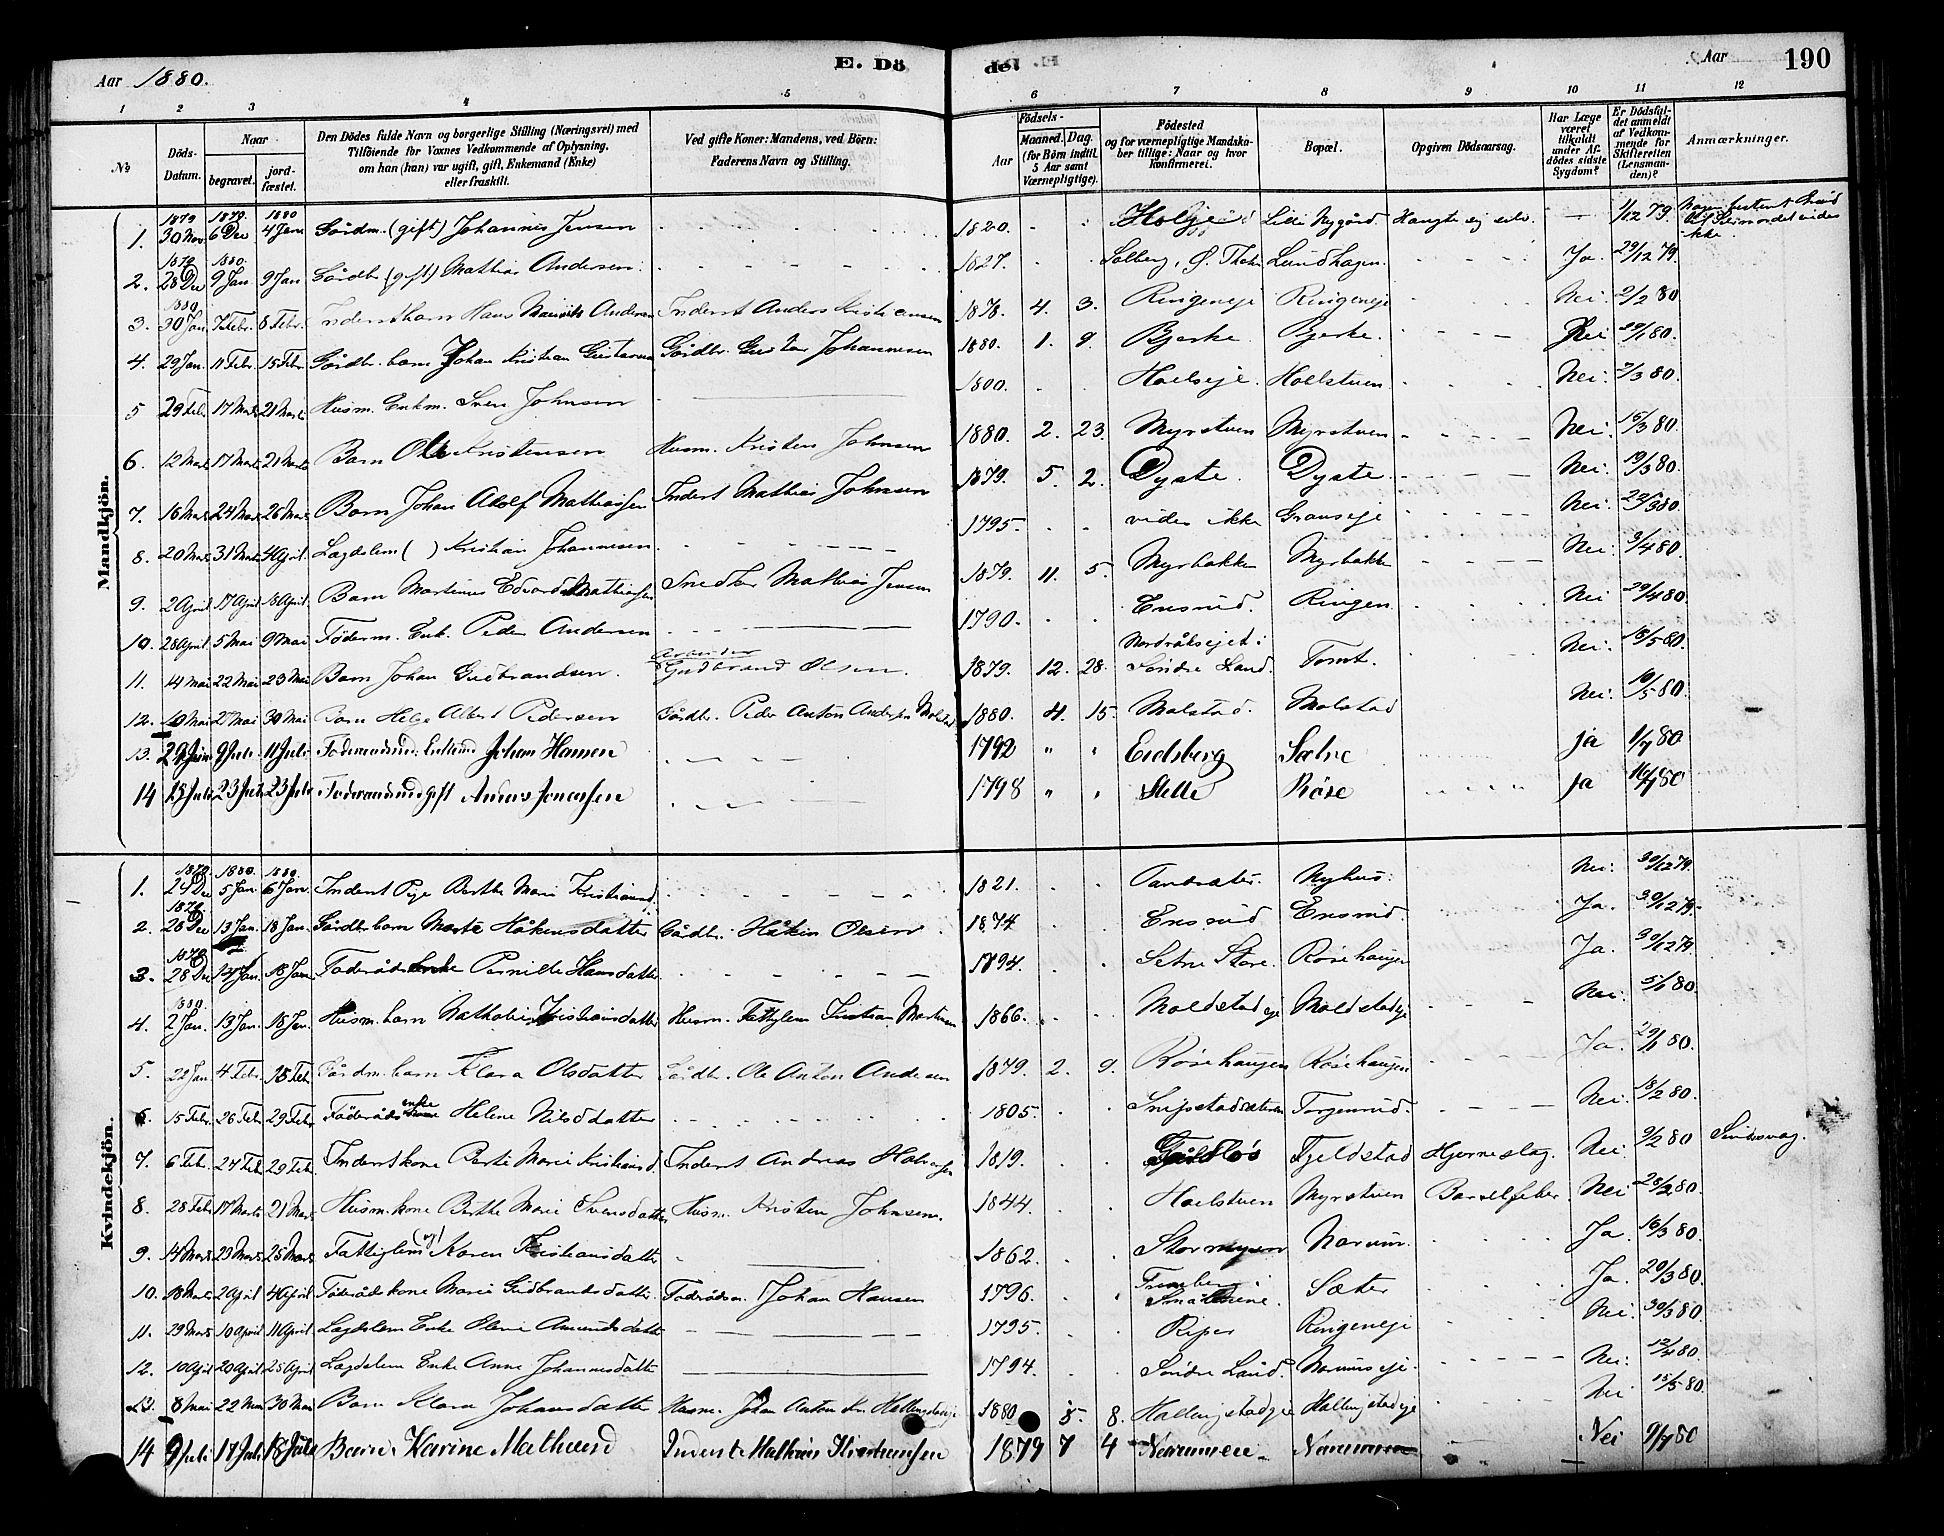 SAH, Vestre Toten prestekontor, H/Ha/Haa/L0010: Ministerialbok nr. 10, 1878-1894, s. 190